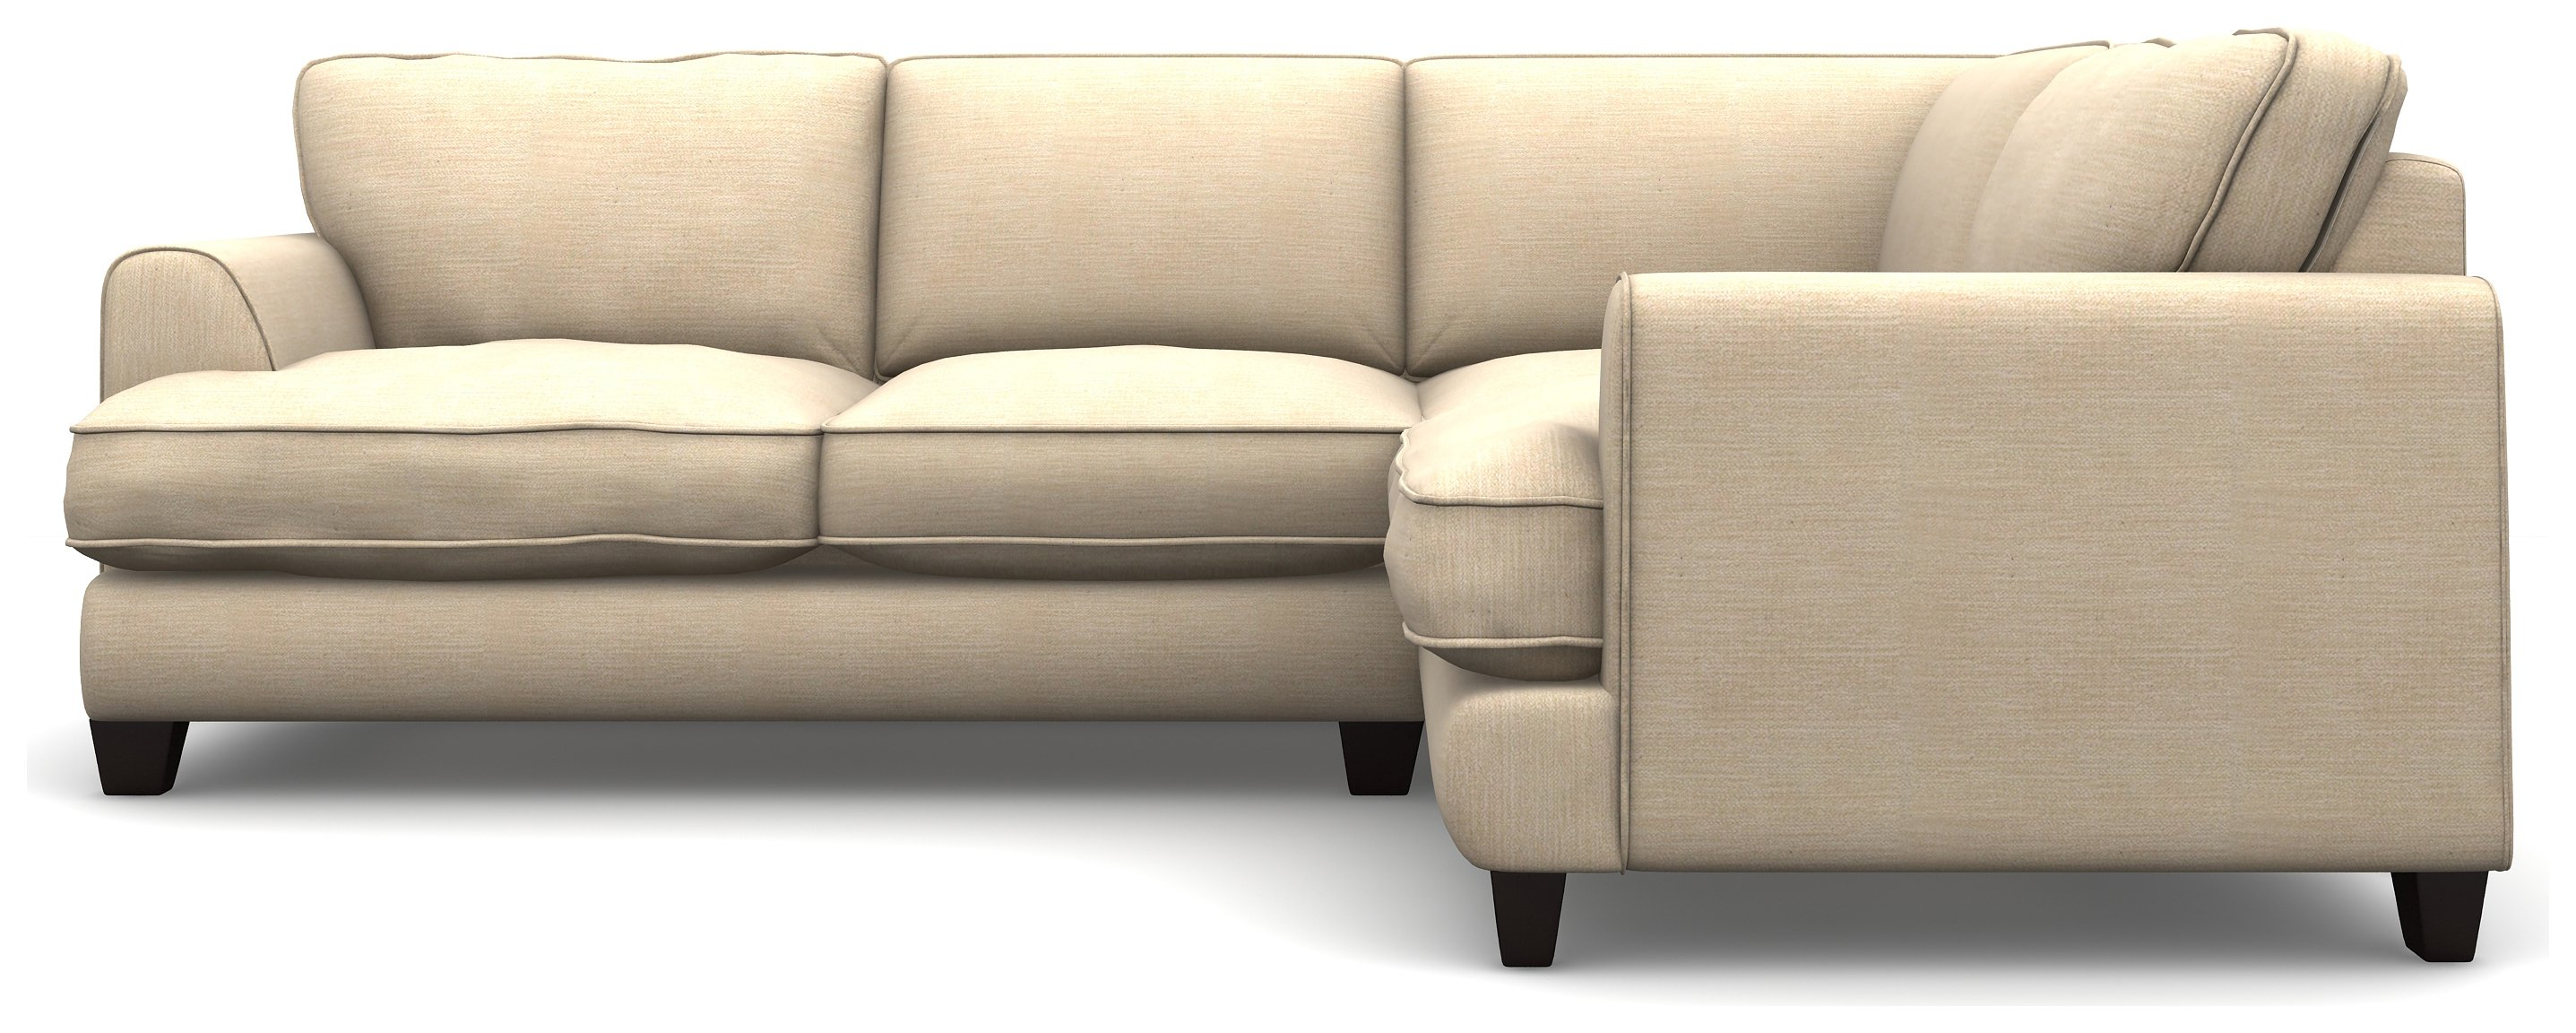 Argos Home Hampstead Right Corner Fabric Sofa - Beige